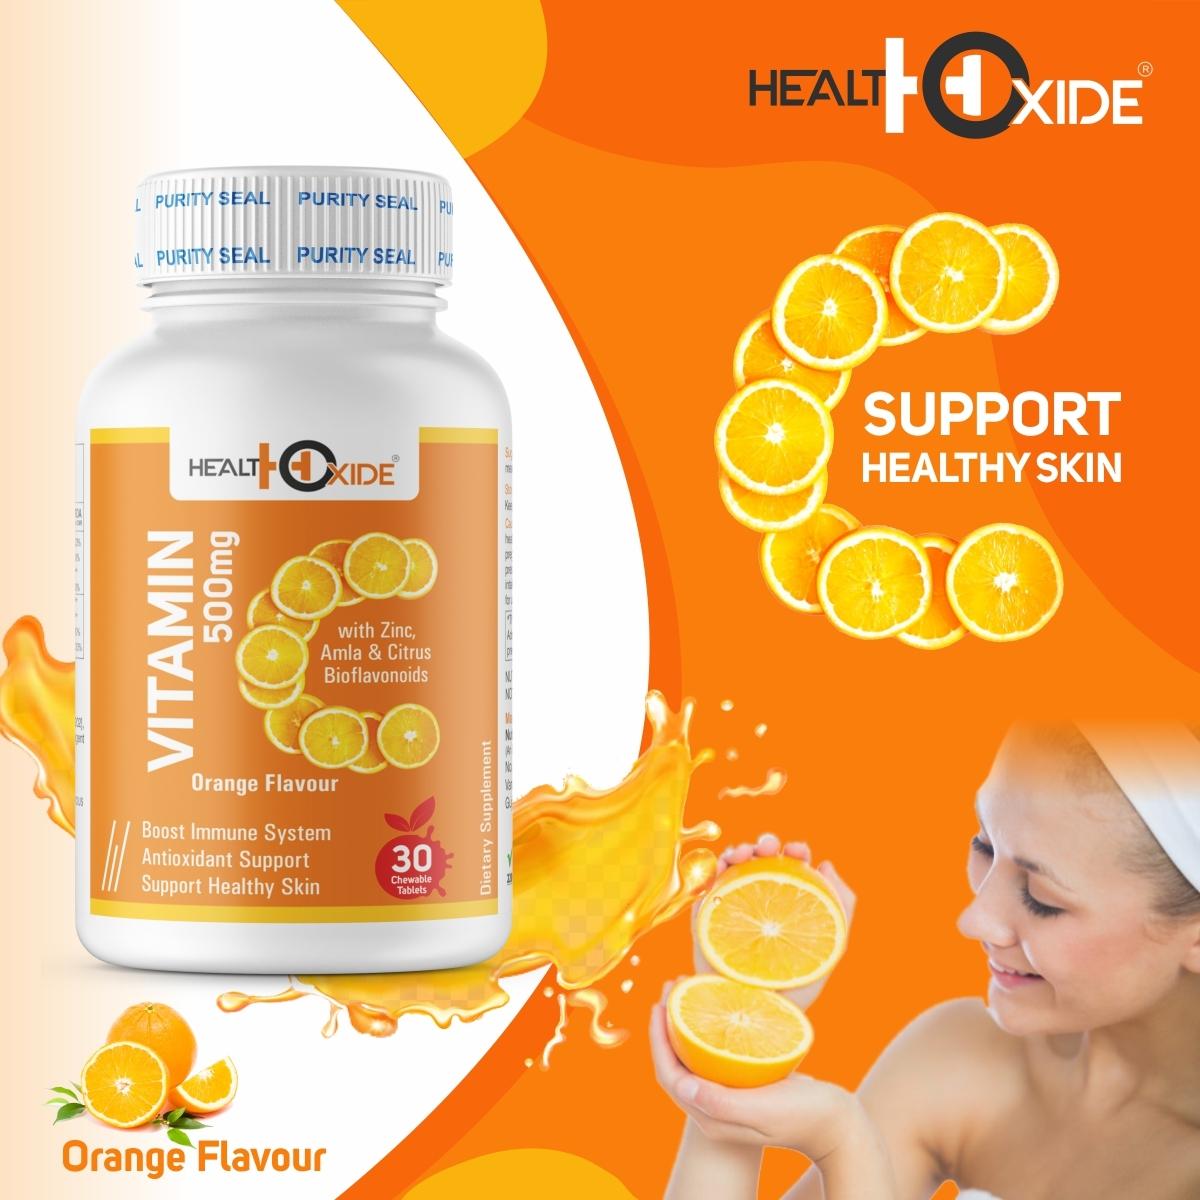 Healthoxide Vitamin C 500mg Chewable Orange Flavour